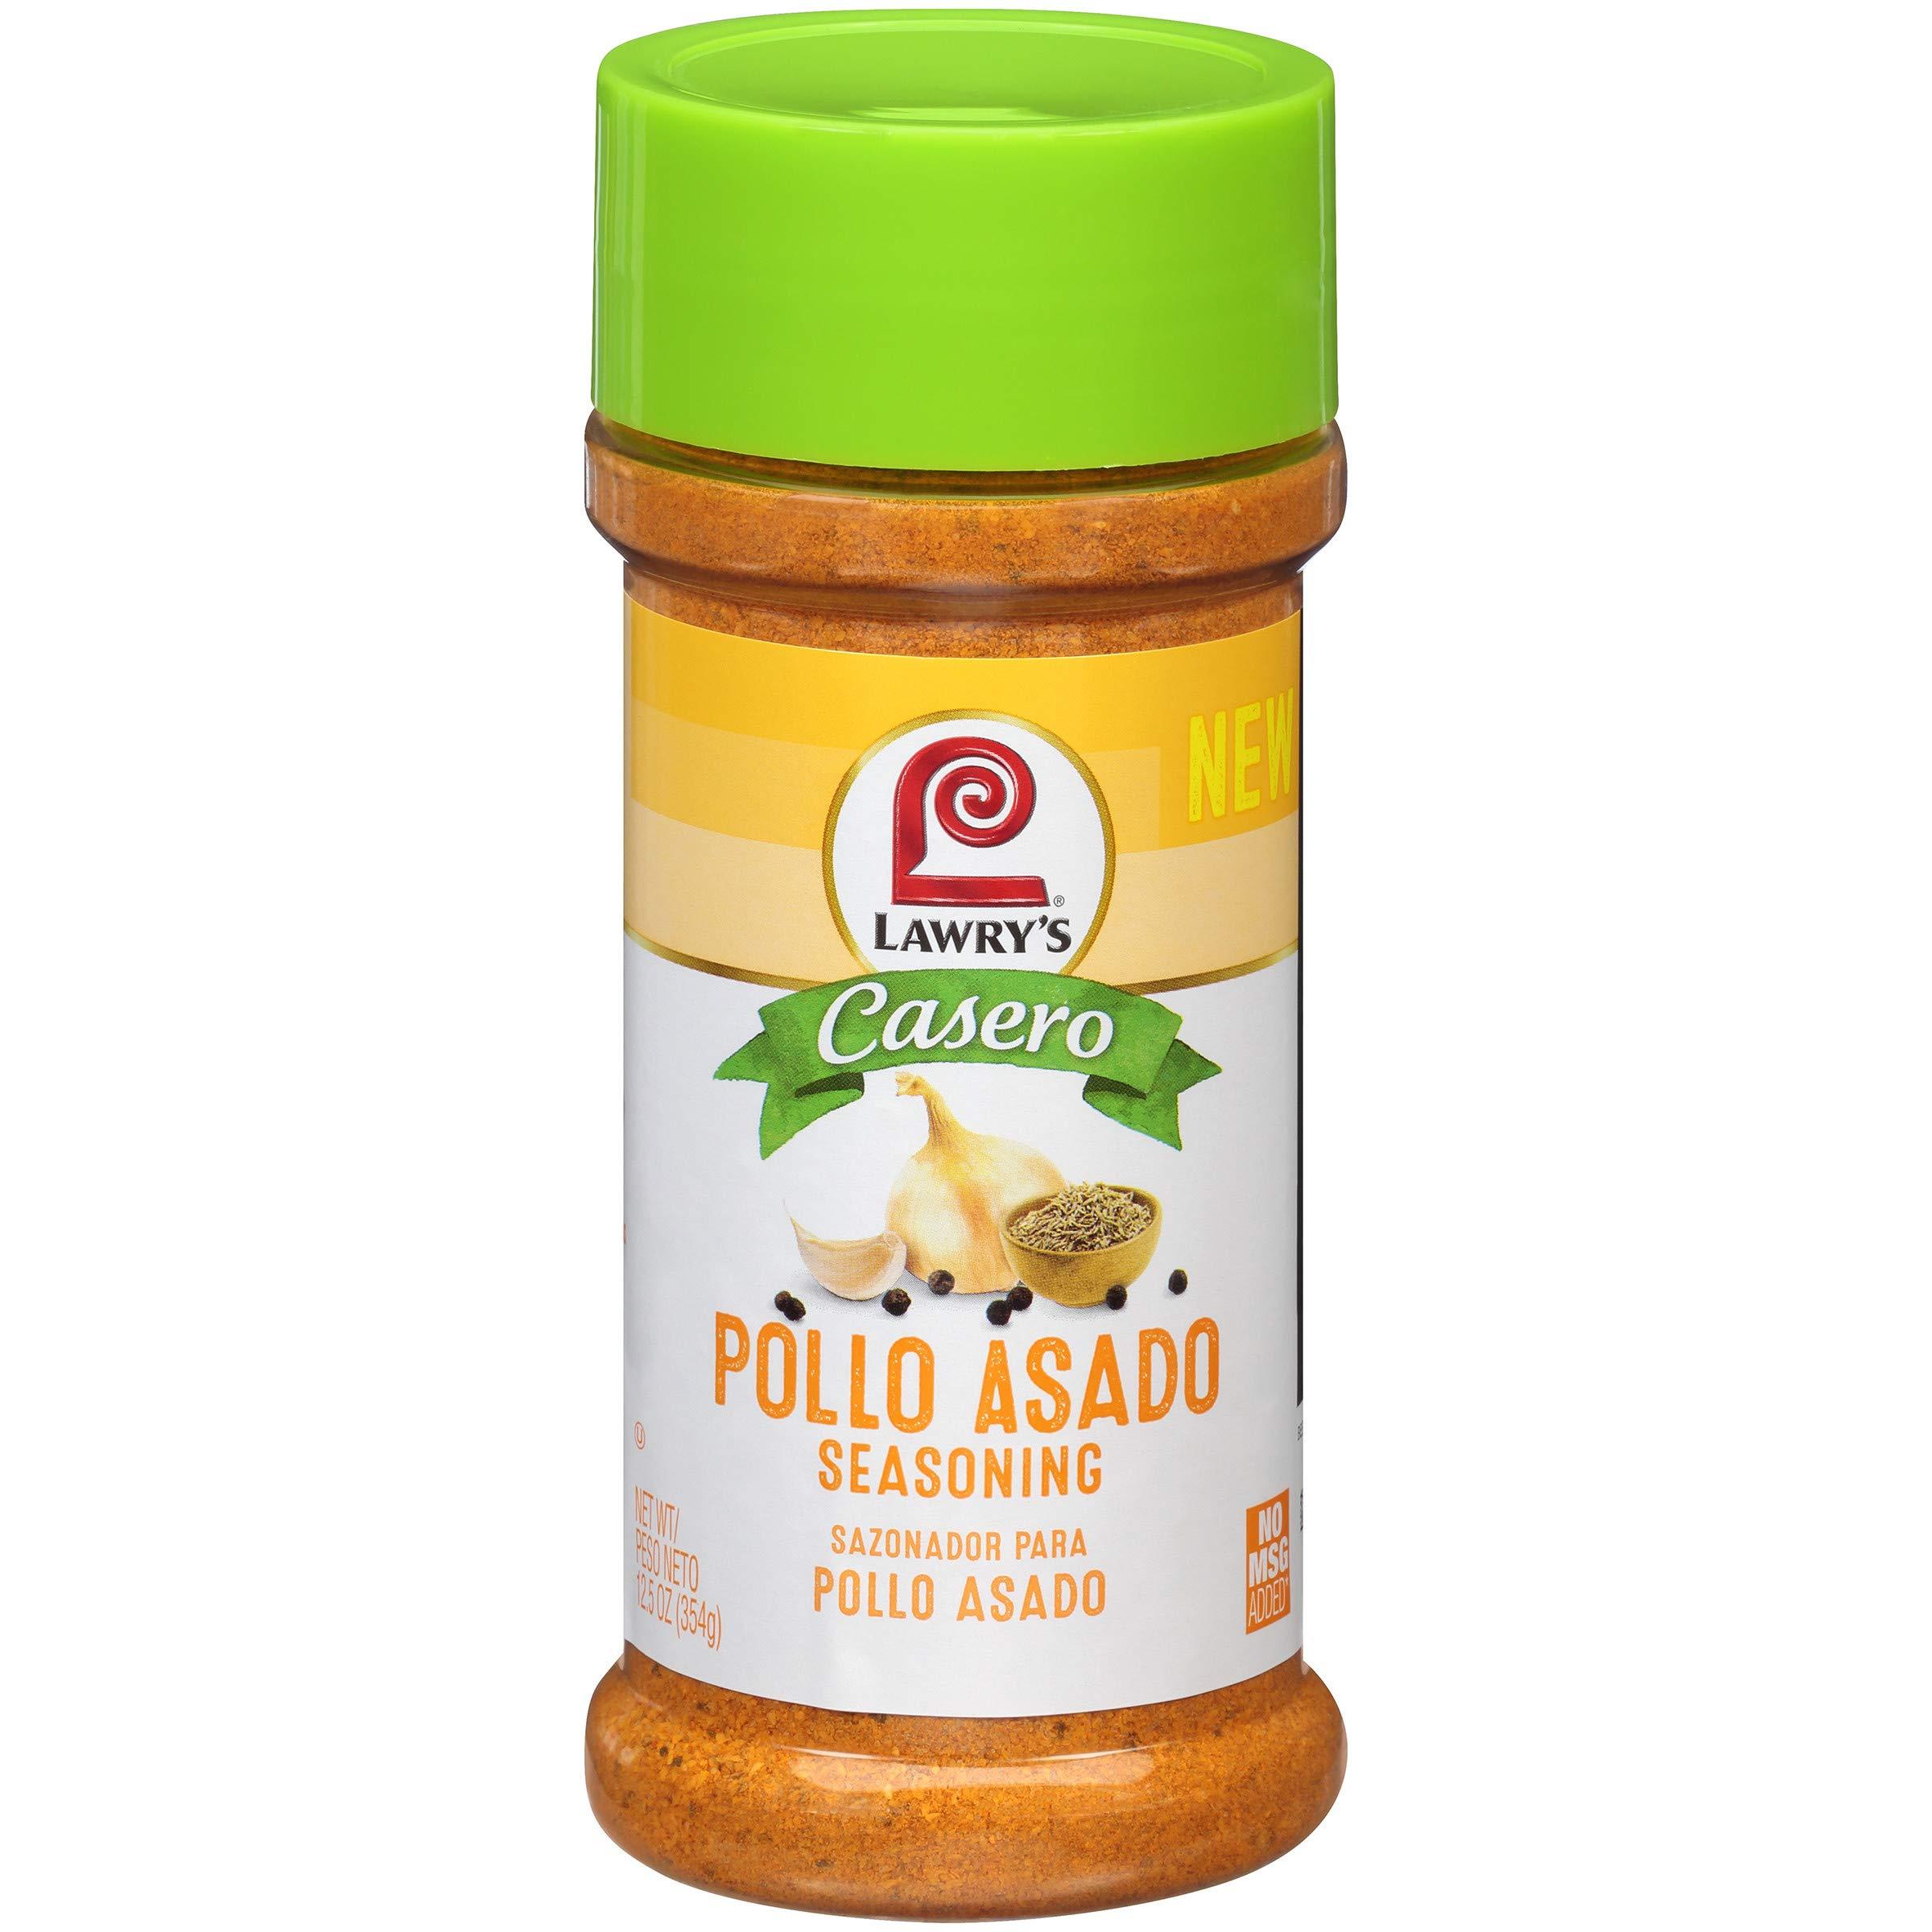 Lawry's Pollo Asado Seasoning, 12.5 Ounce (Pack of 12)